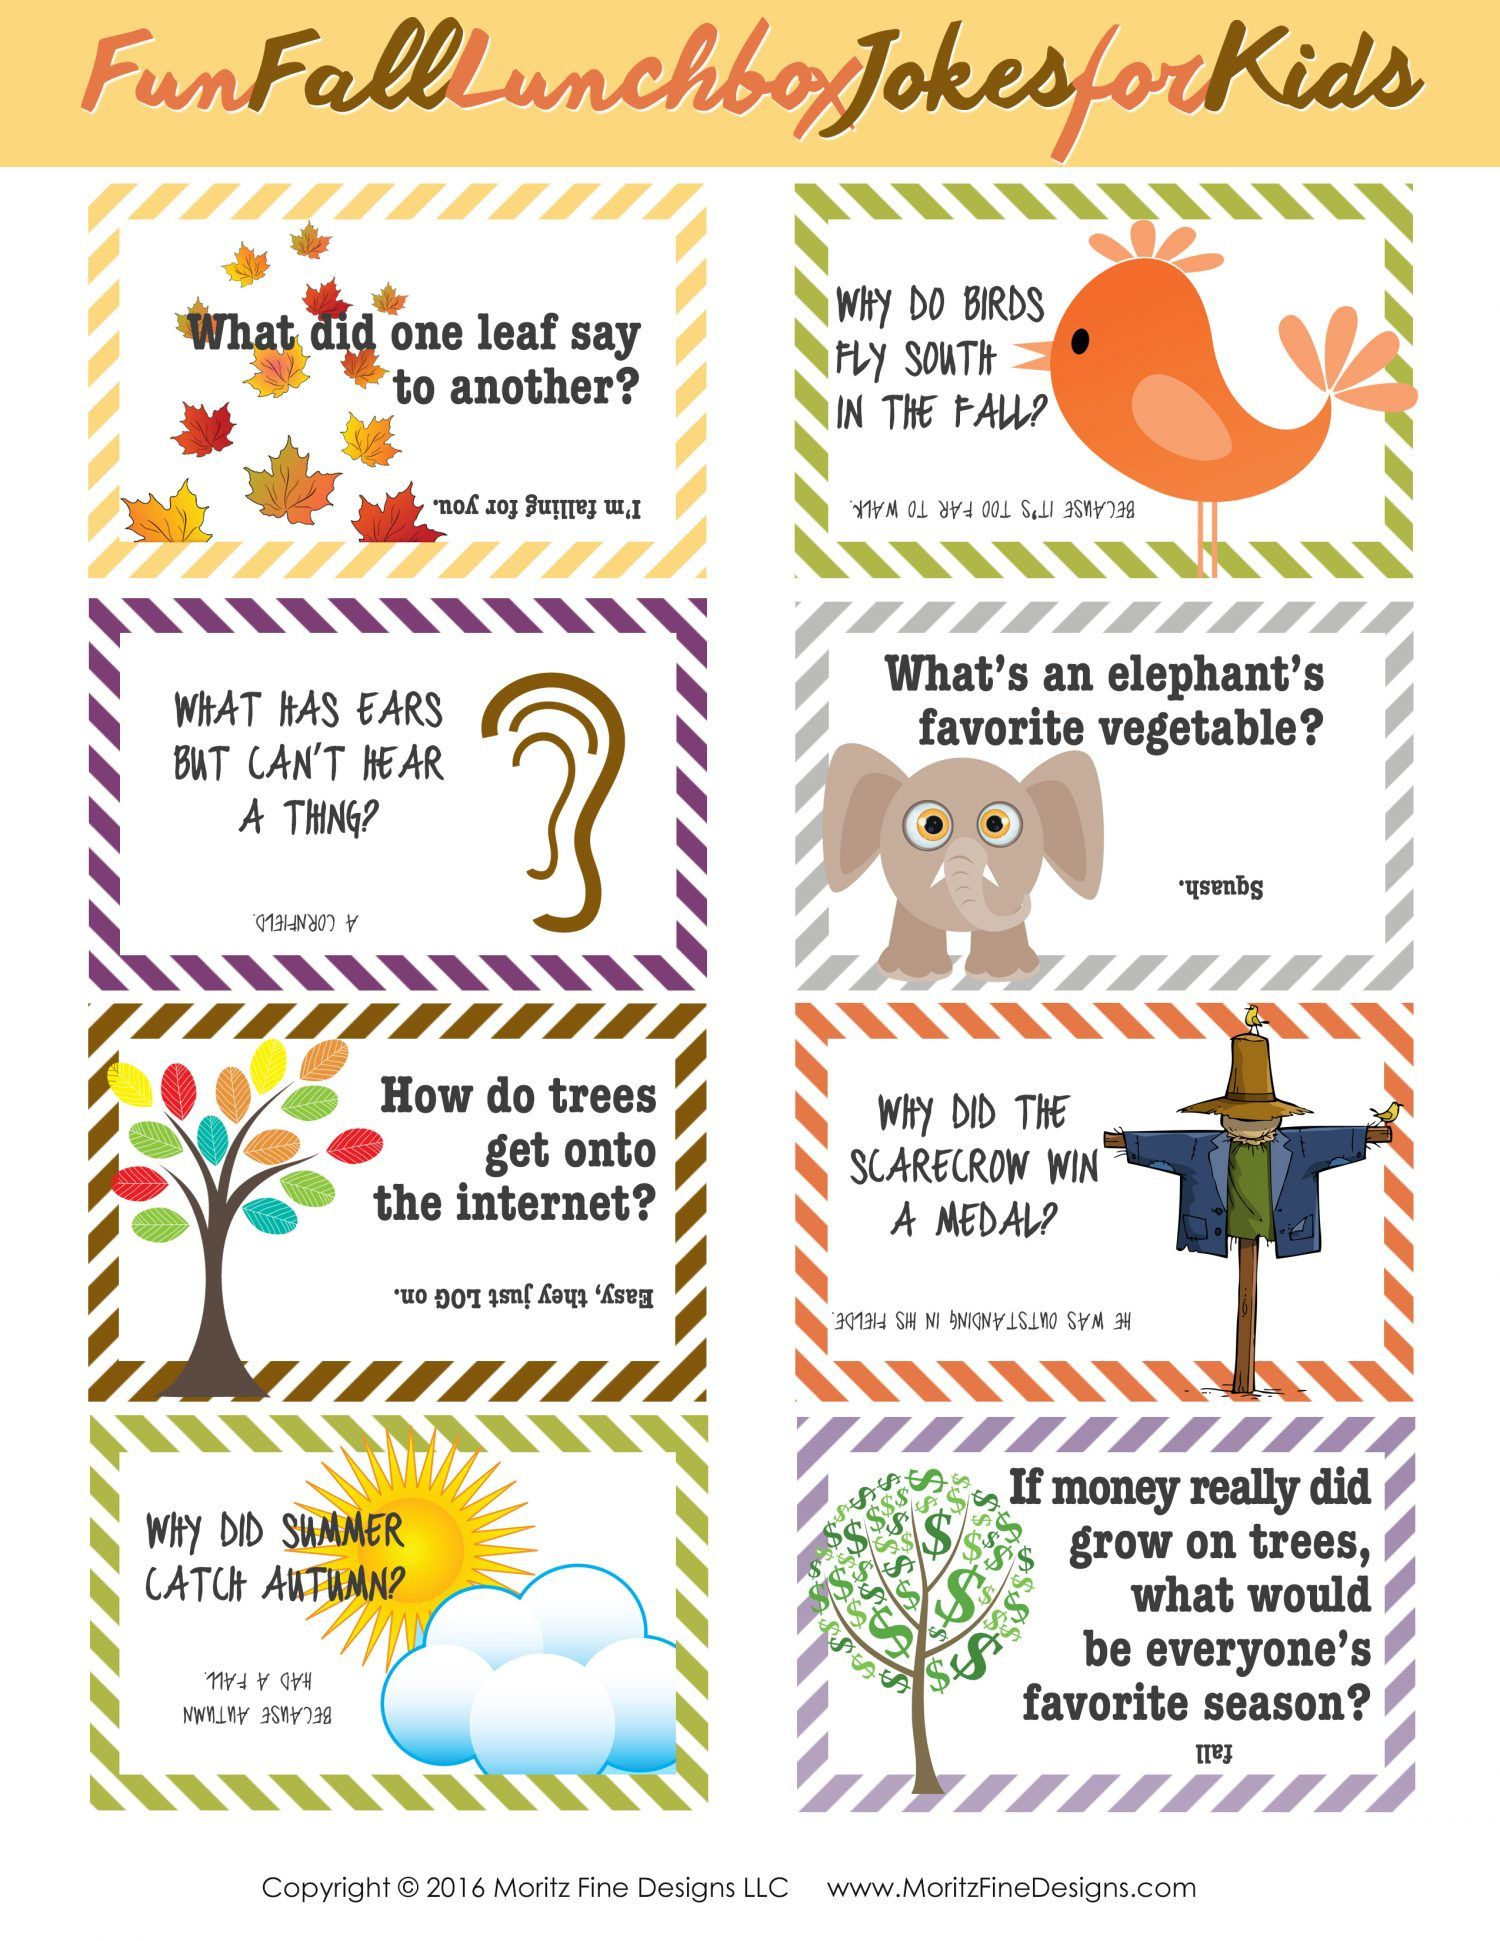 Fall Lunch Box Jokes For Kids